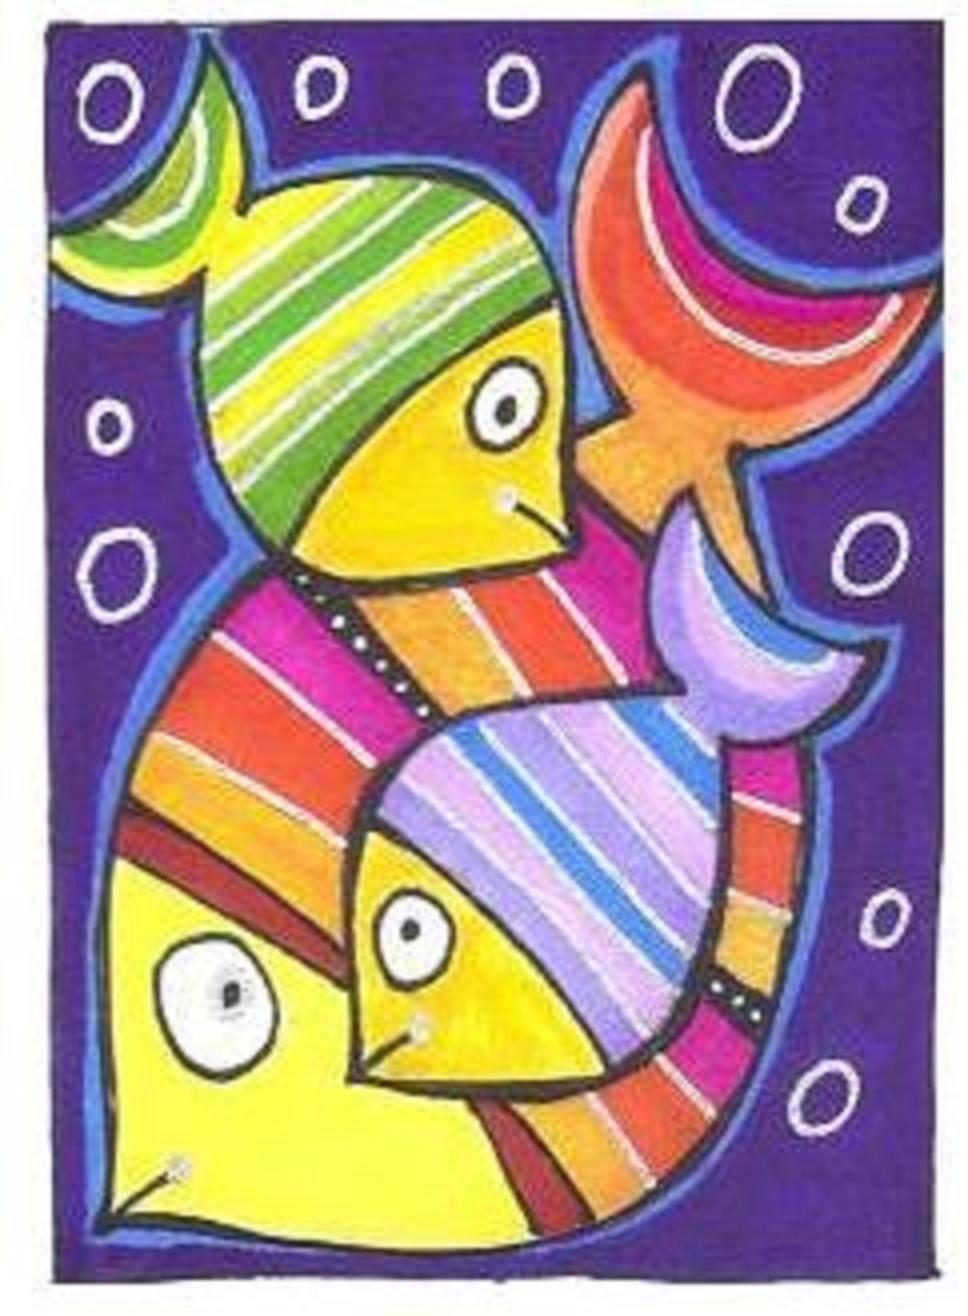 Dit Plaatje Past Goed Bij De Term Compositie Omdat Dit Plaatje Verschillende Delen Van De V Detskie Risunki Folk Art Kartiny Risunki Detskie Tvorcheskie Proekty